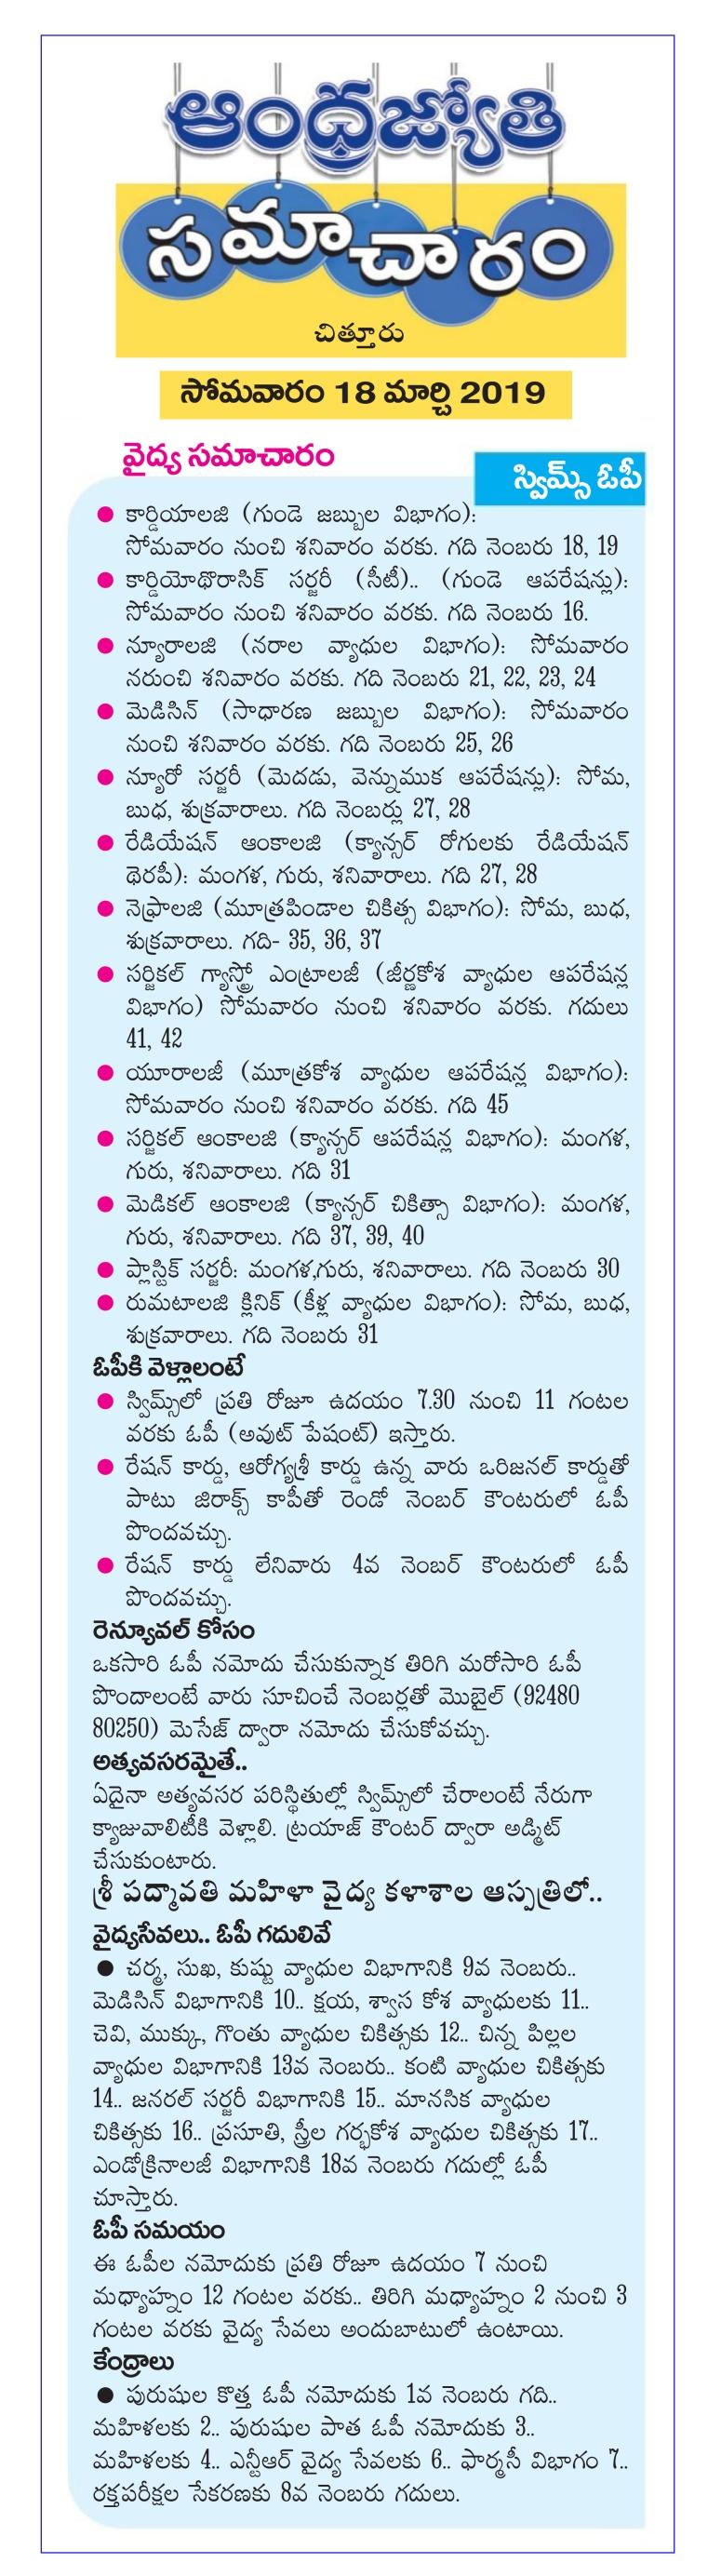 Health Services in Tirupati Jyothy 18-03-2019.jpg